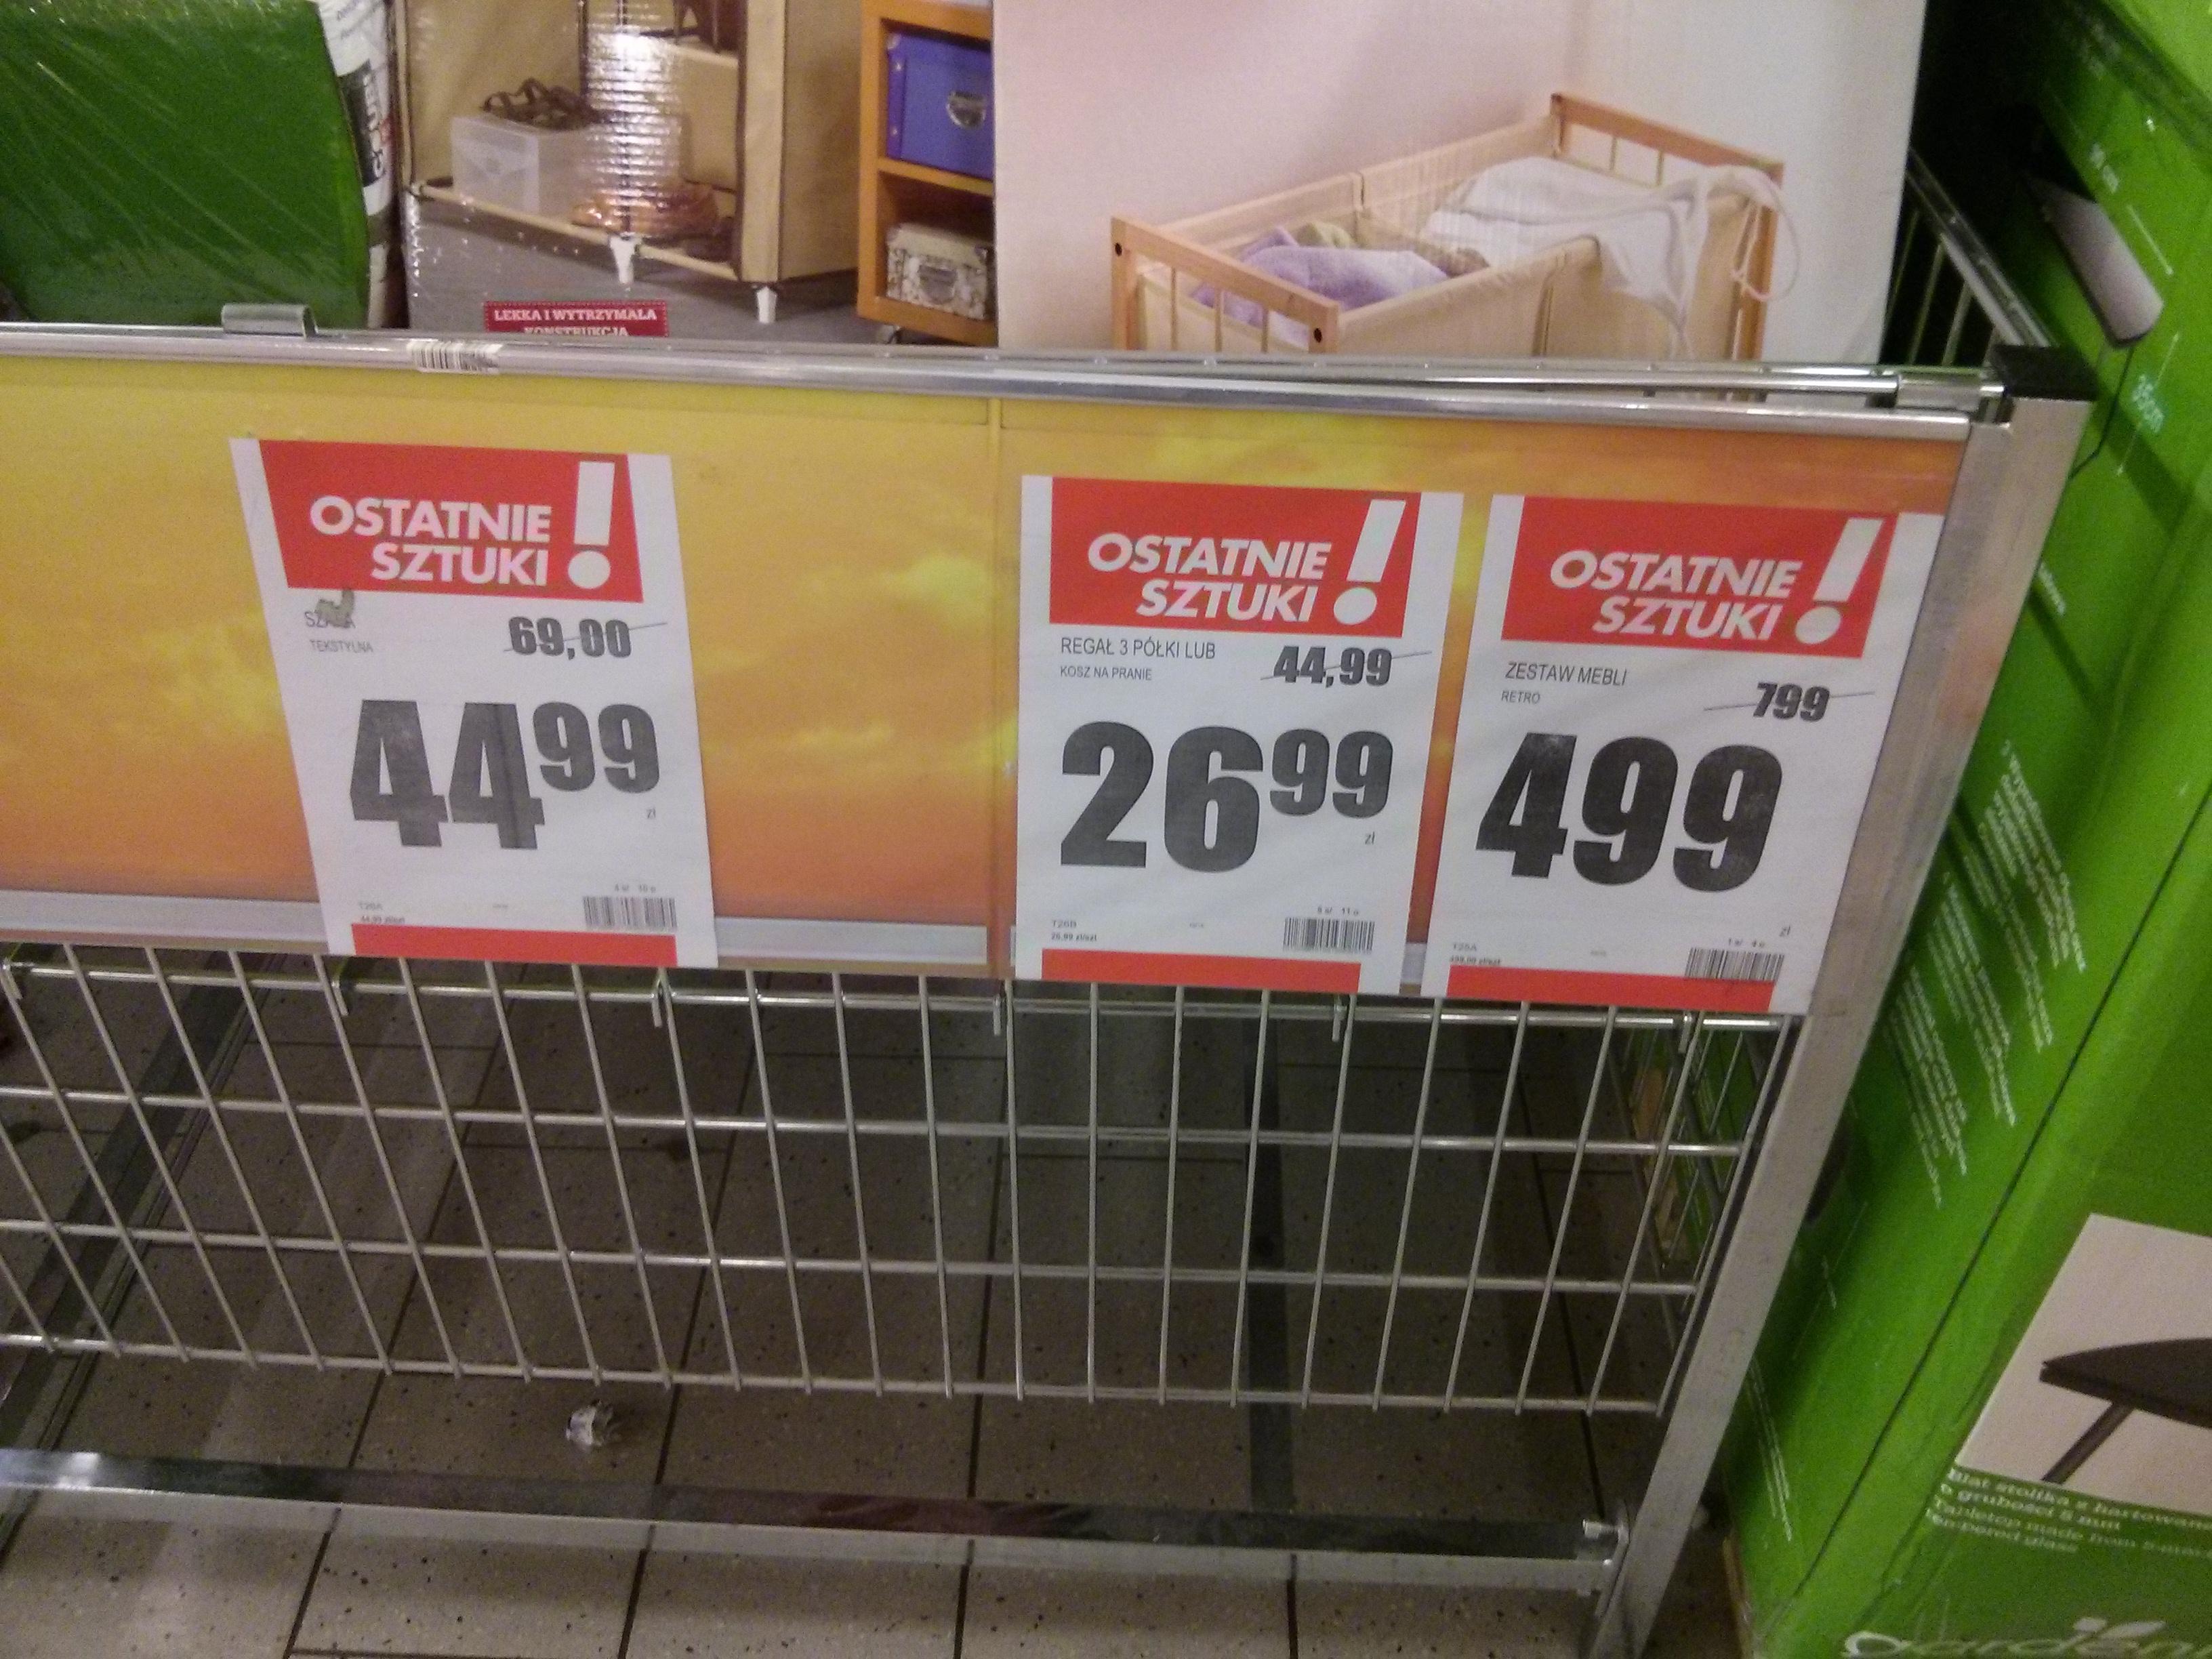 OBNIŻKA cen mebli @ Biedronka